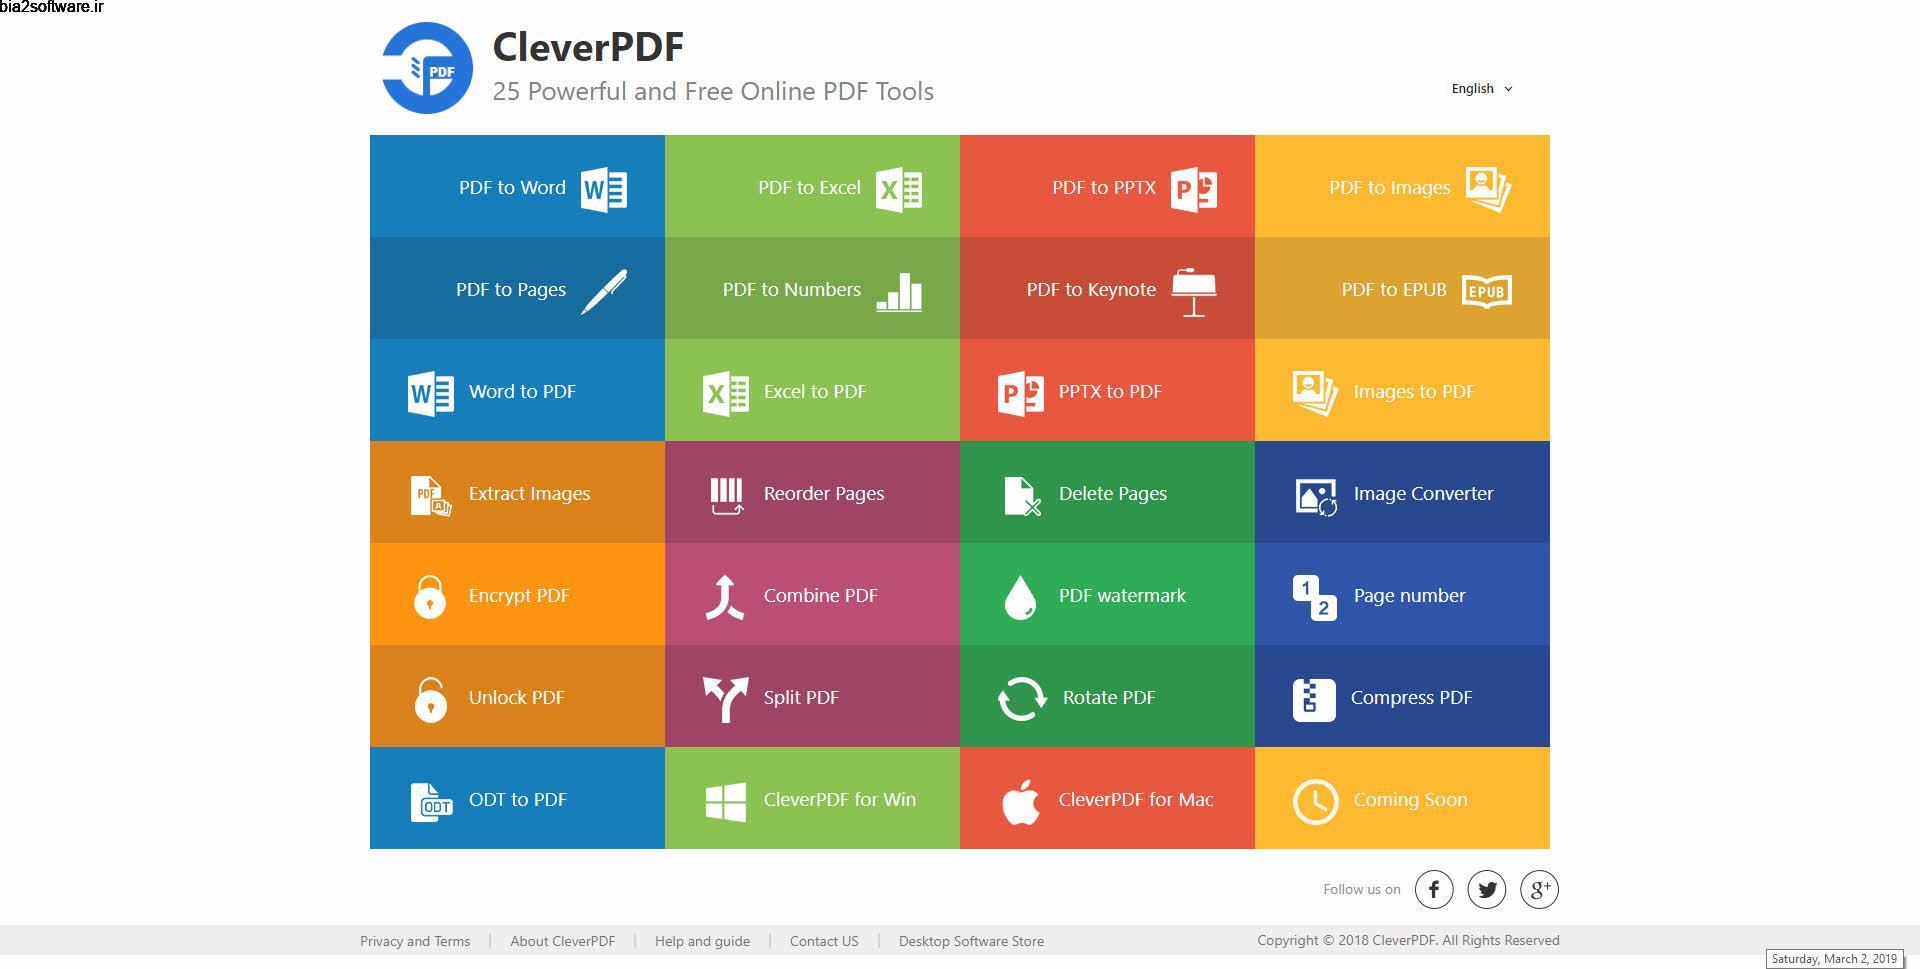 CleverPDF 3.0.0 ابزار قدرتمند جهت کار بر روی اسناد PDF